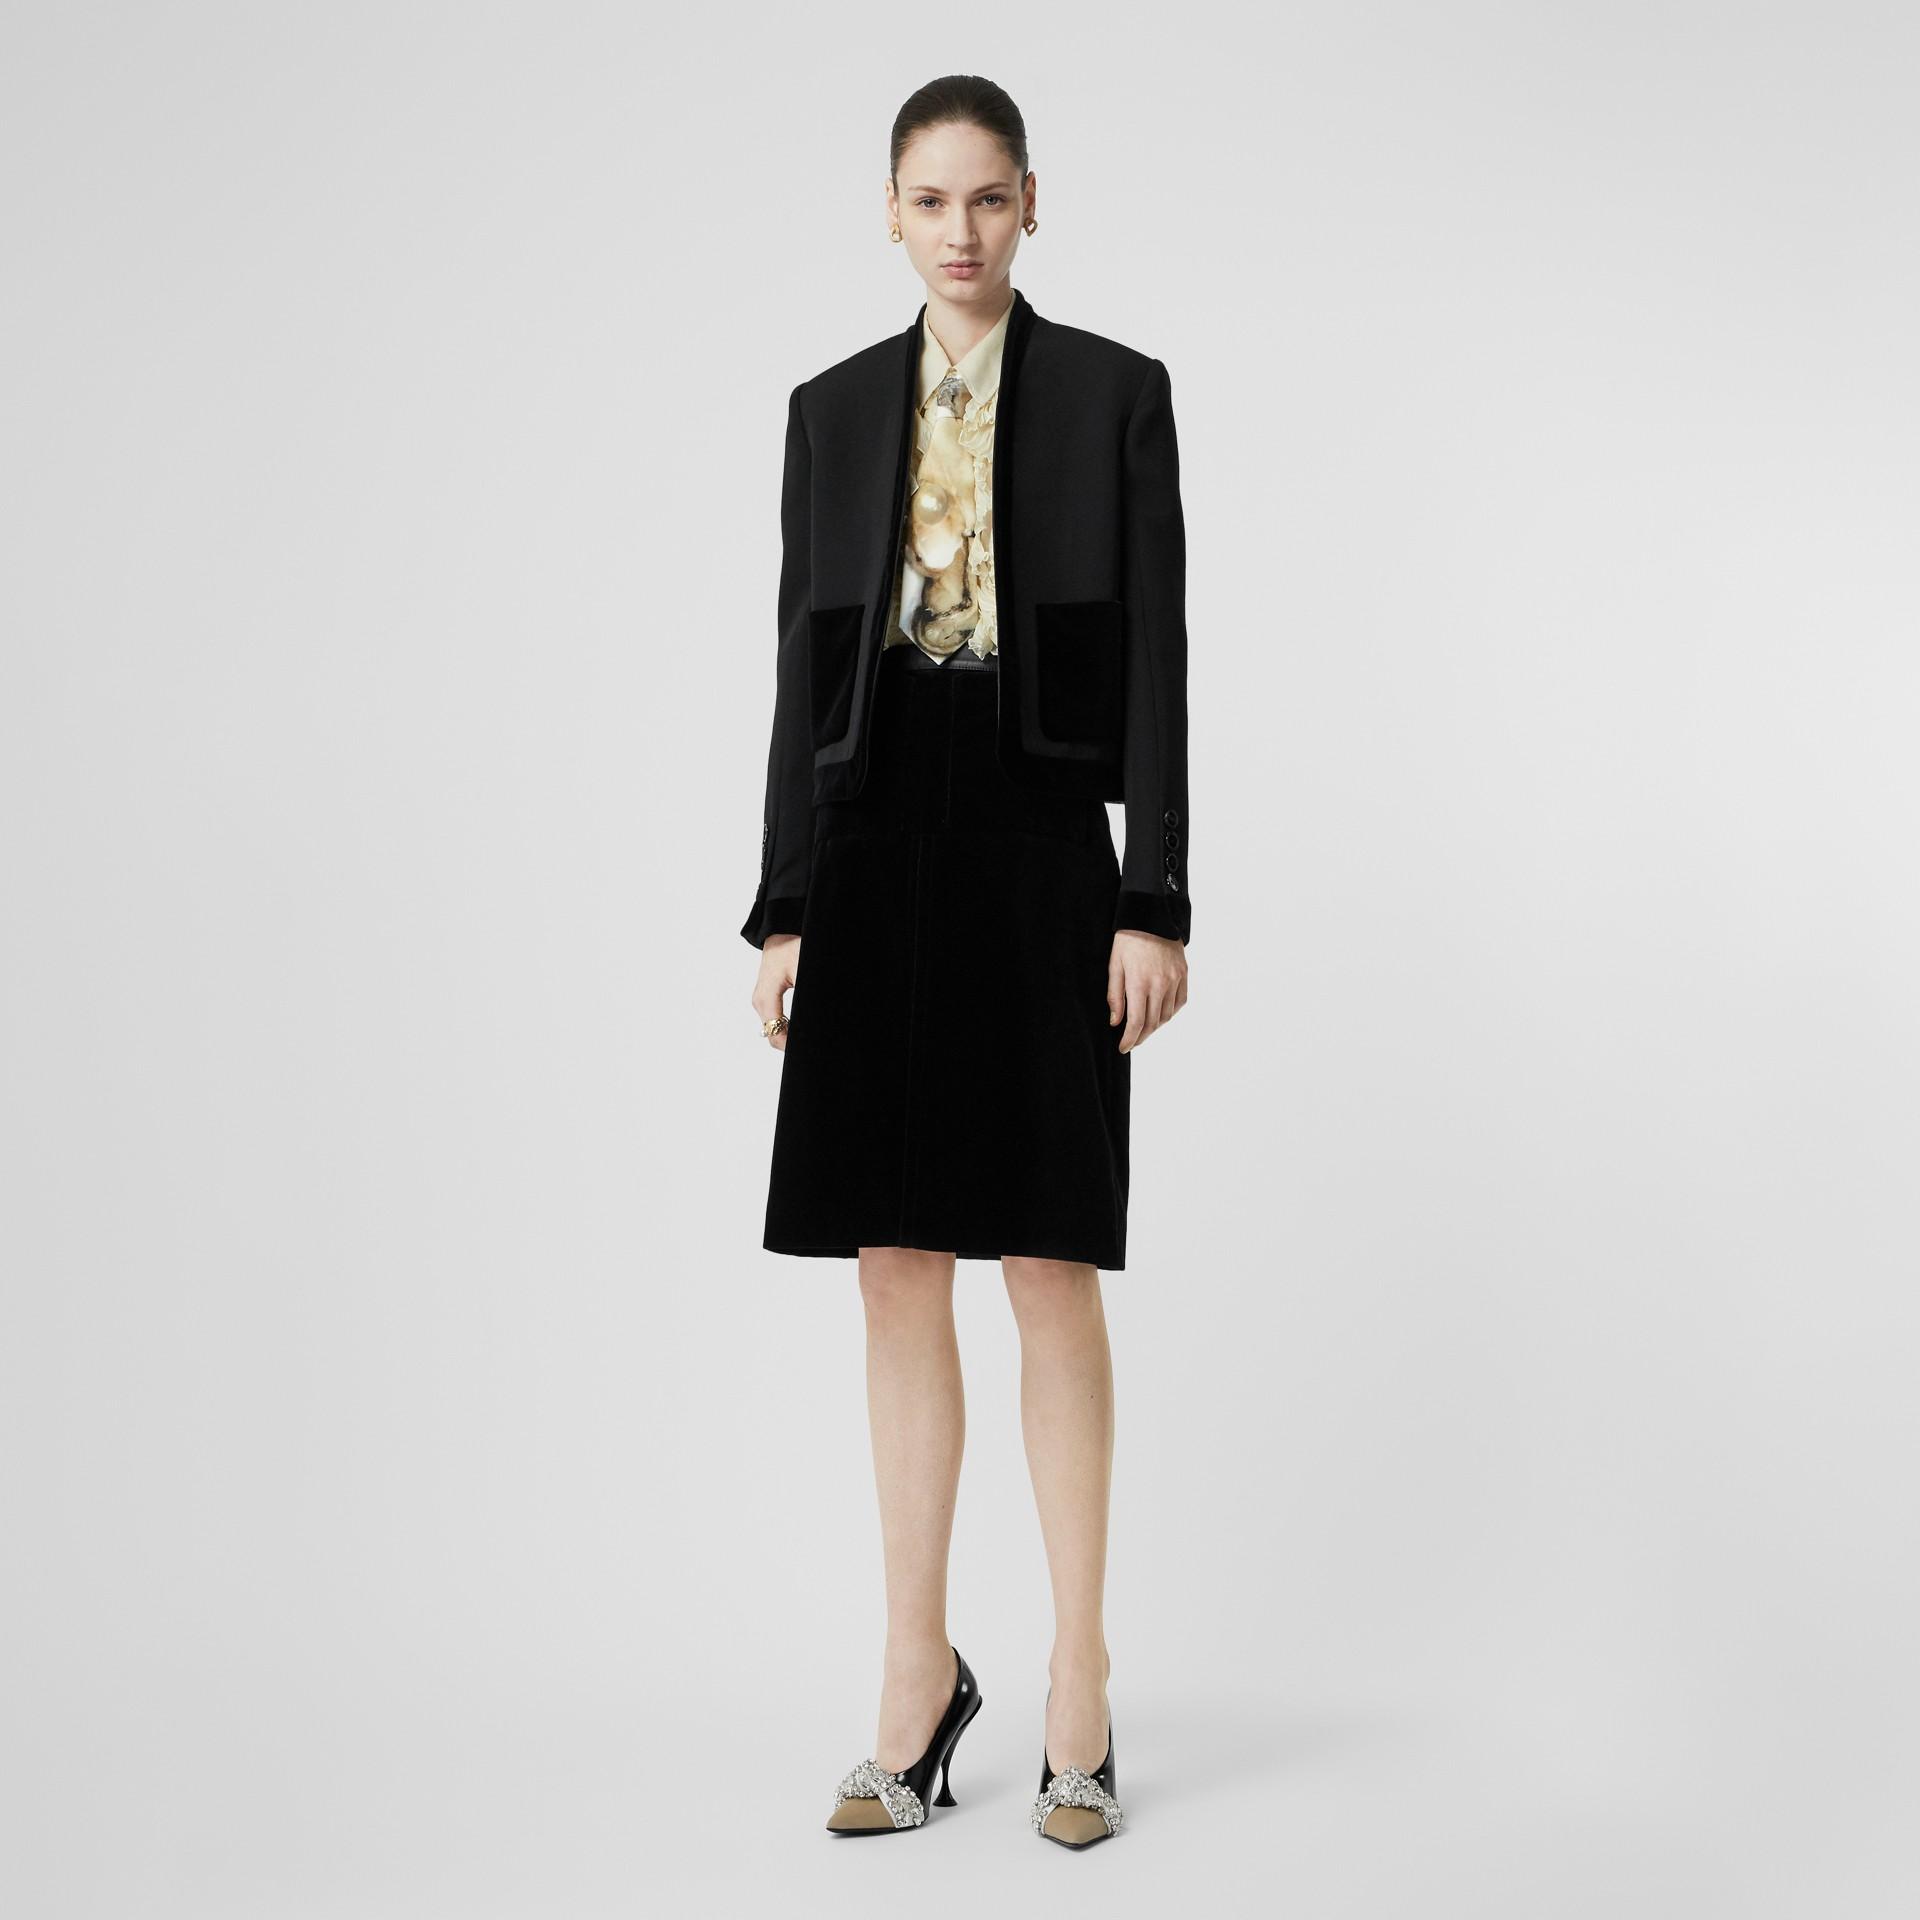 Velvet Detail Wool Tailored Jacket in Black - Women | Burberry - gallery image 0